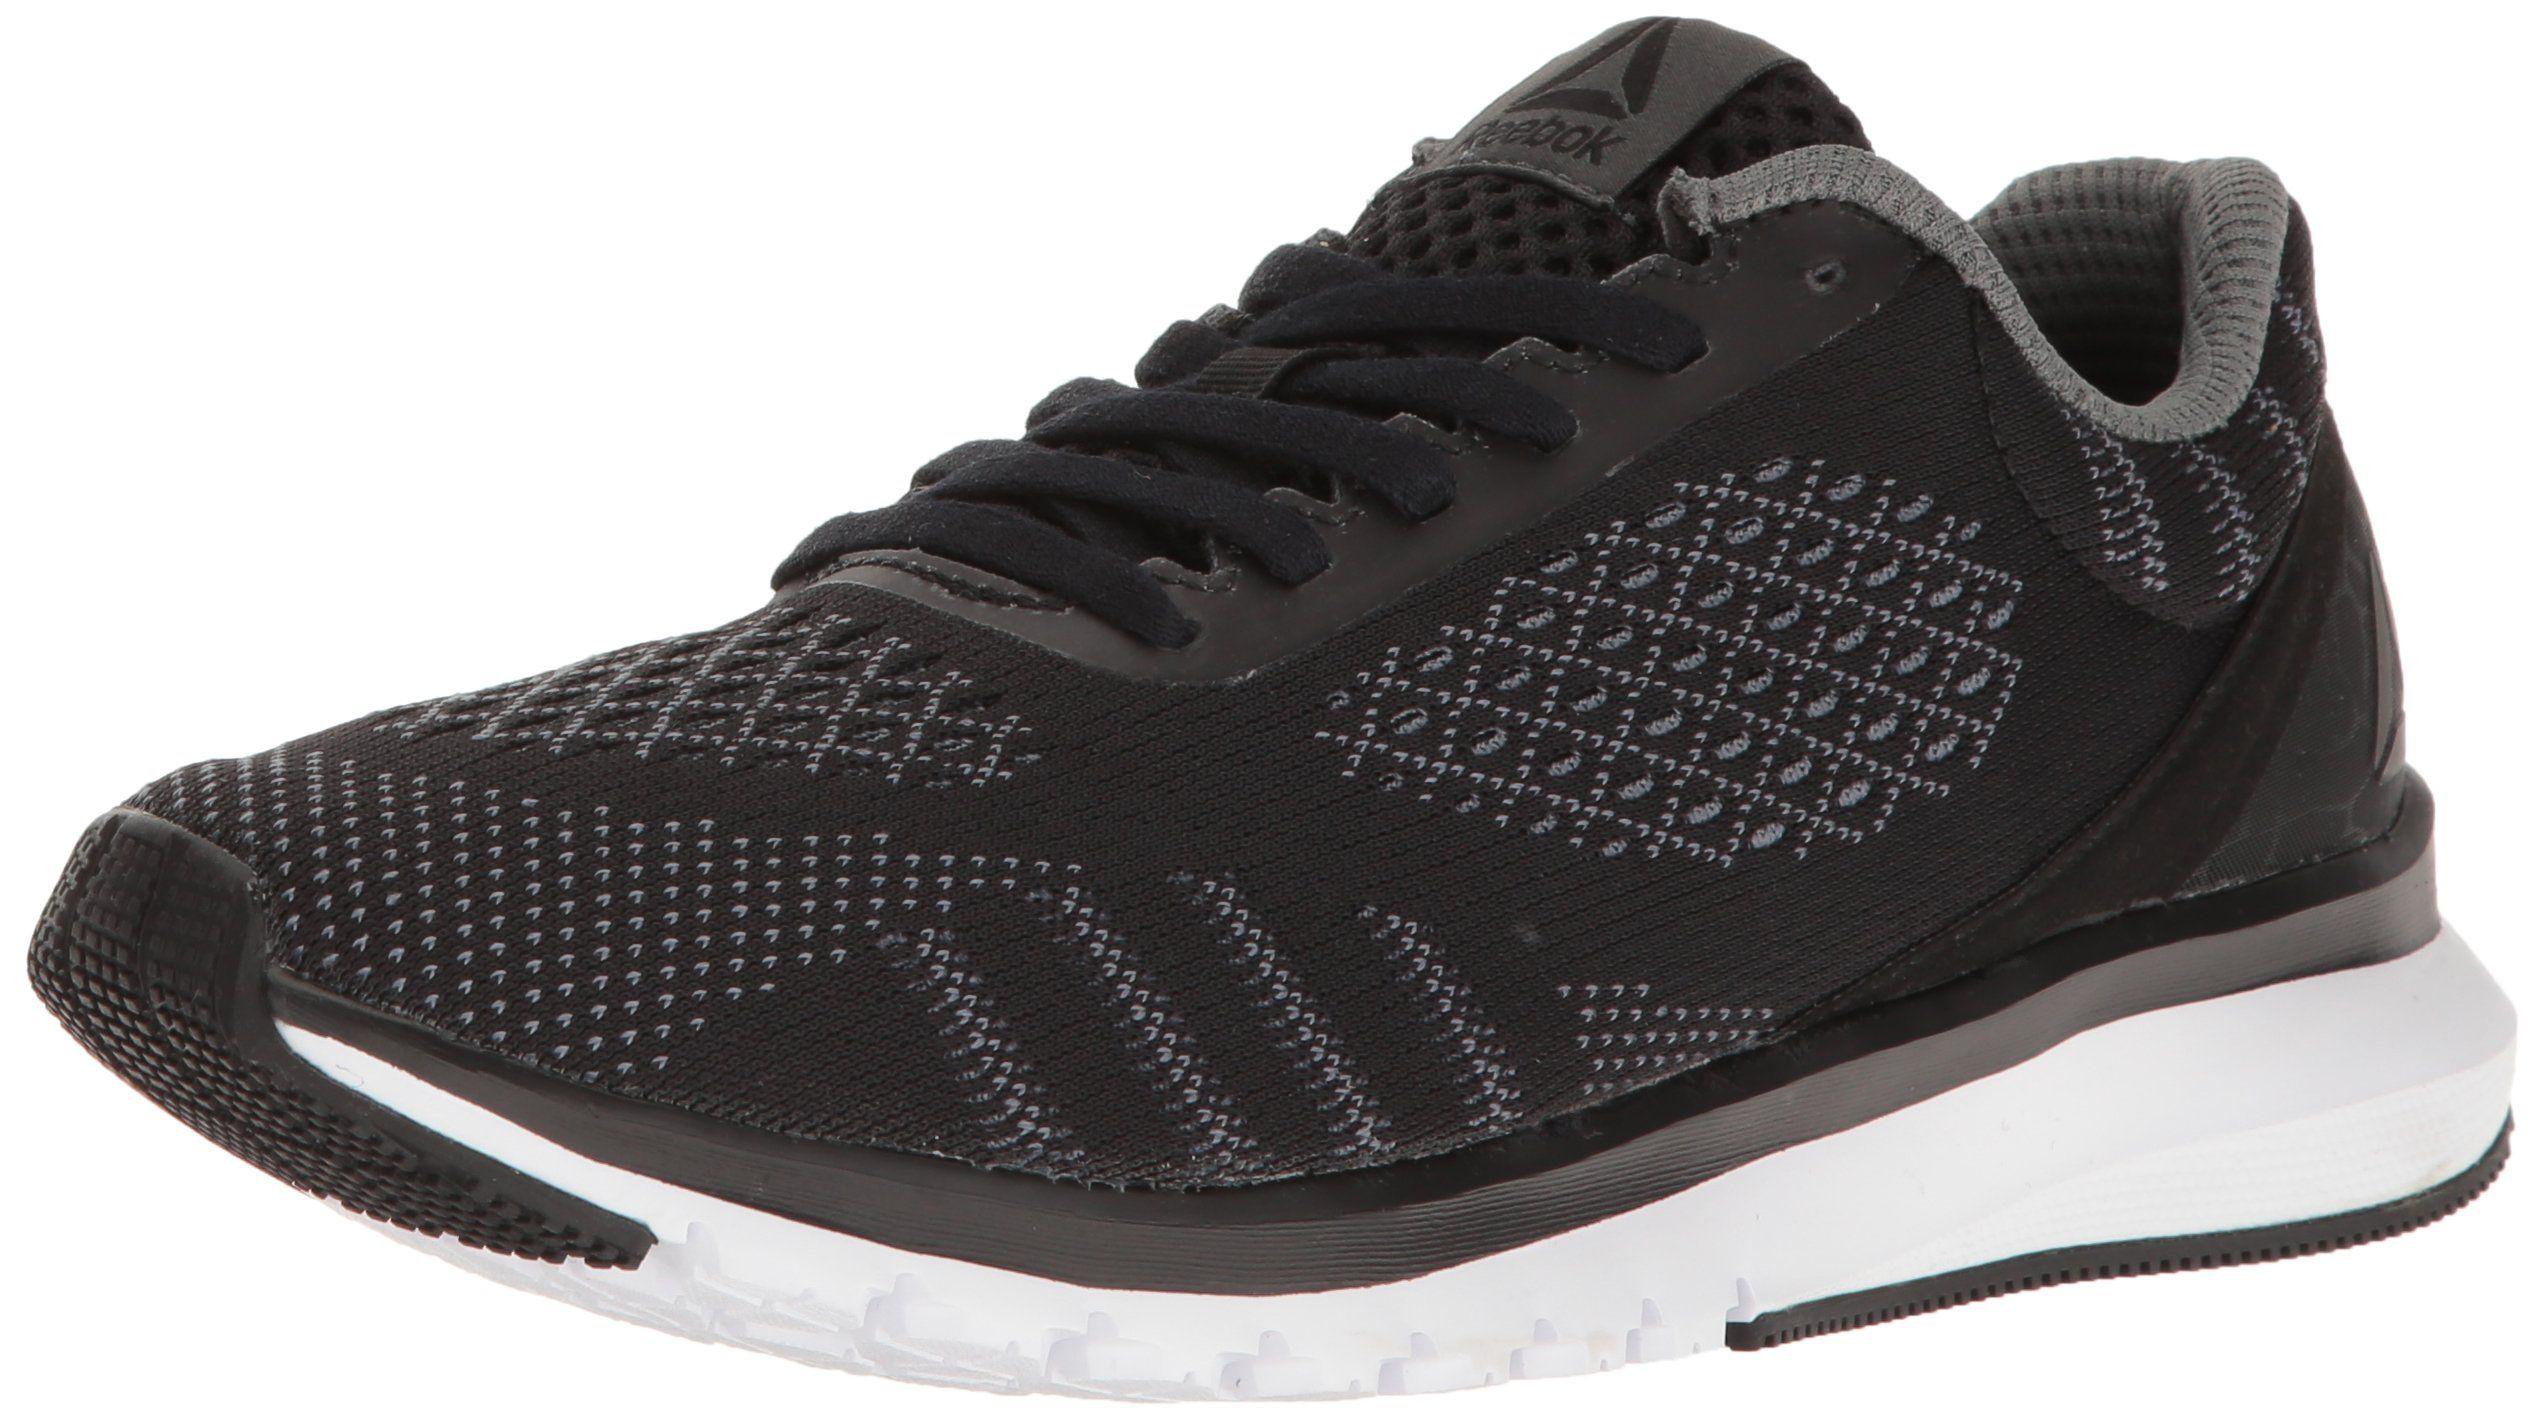 62228bdd5648 Reebok Women s Print Smooth Ultk Running Shoe